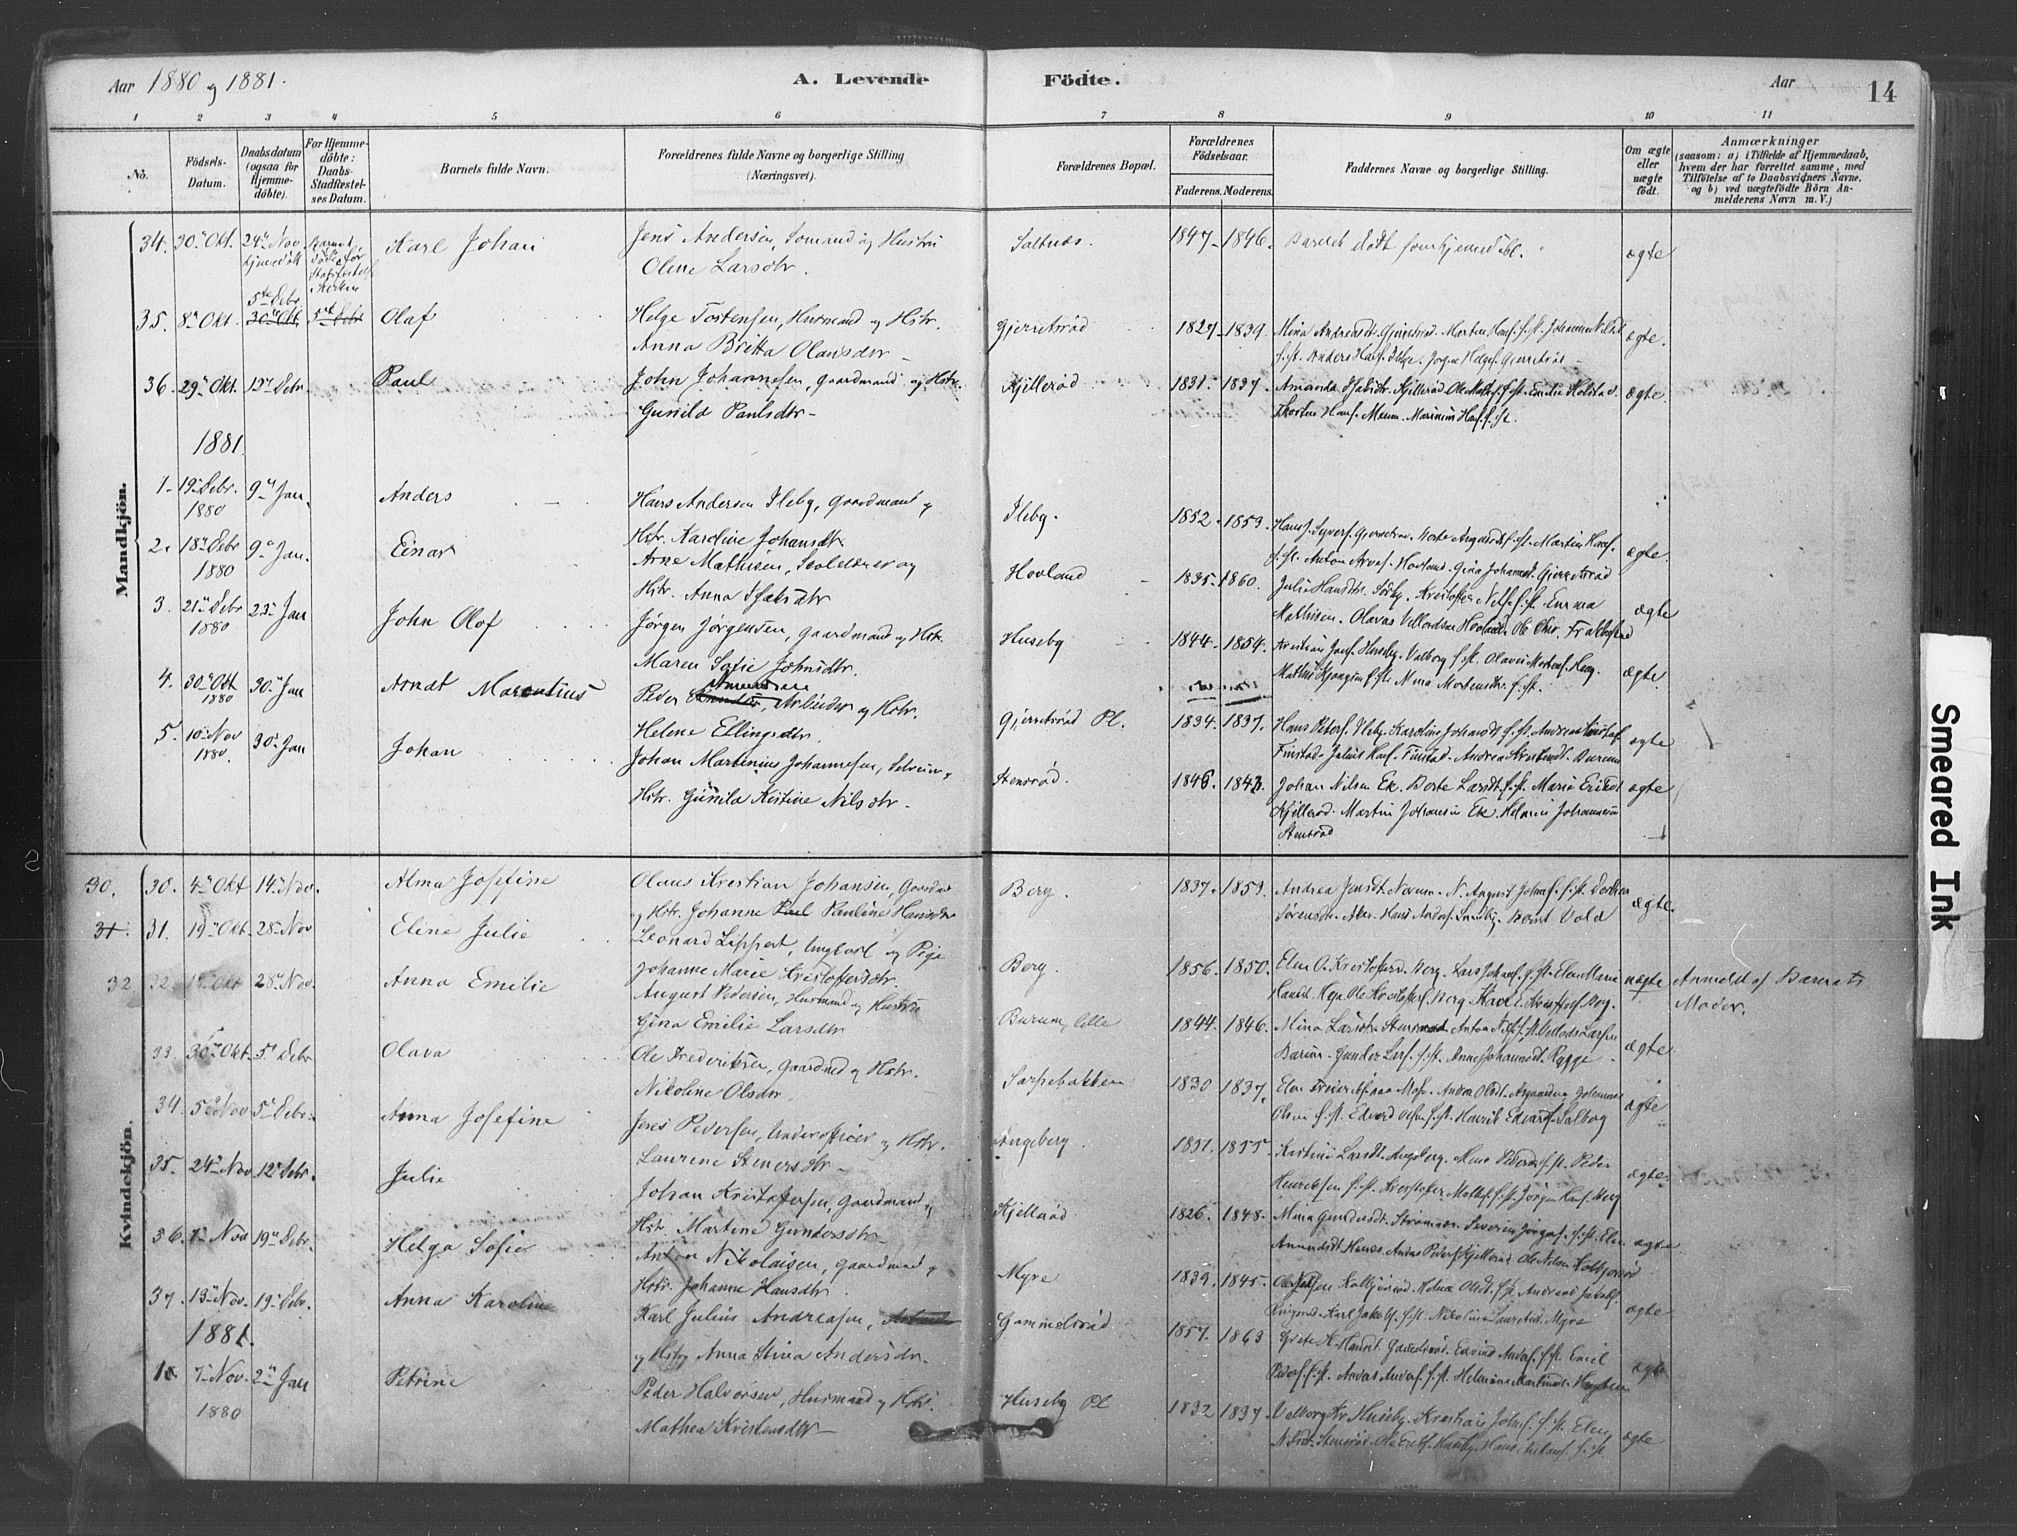 SAO, Råde prestekontor kirkebøker, F/Fa/L0007: Ministerialbok nr. 7, 1878-1902, s. 14